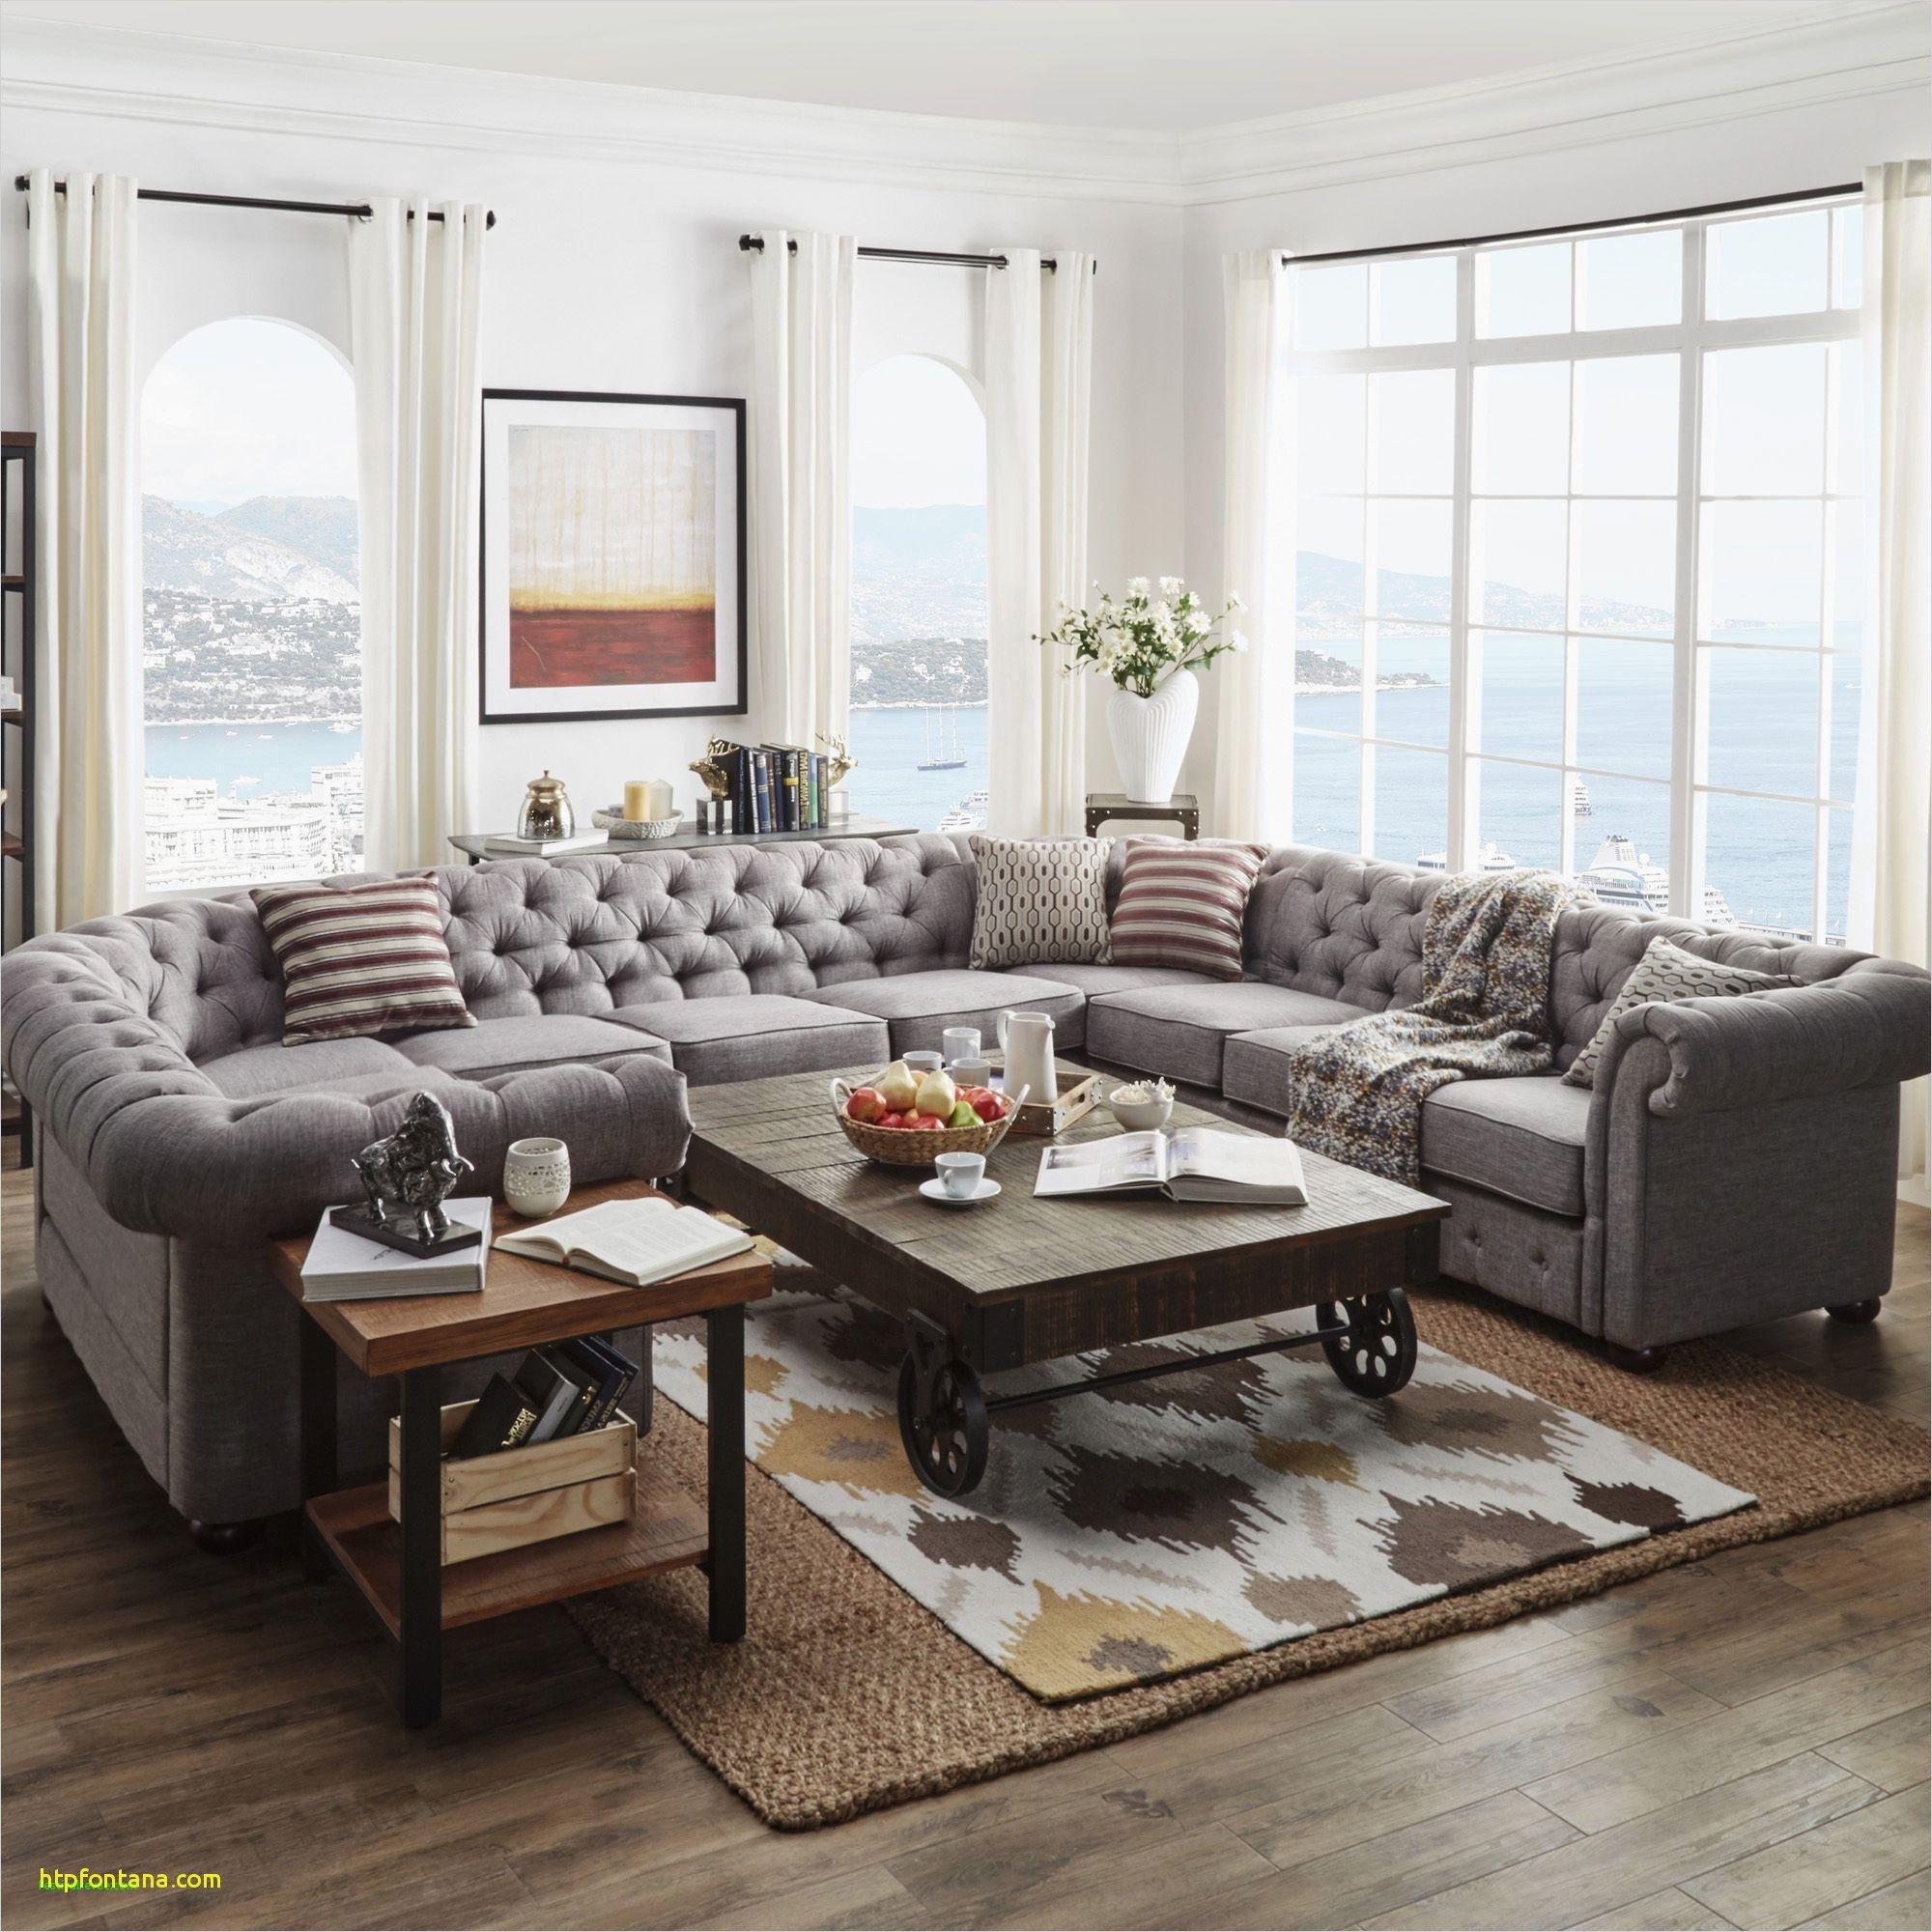 Gray and Brown Bedroom Elegant 10 Famous Dark Hardwood Floors Decorating Ideas